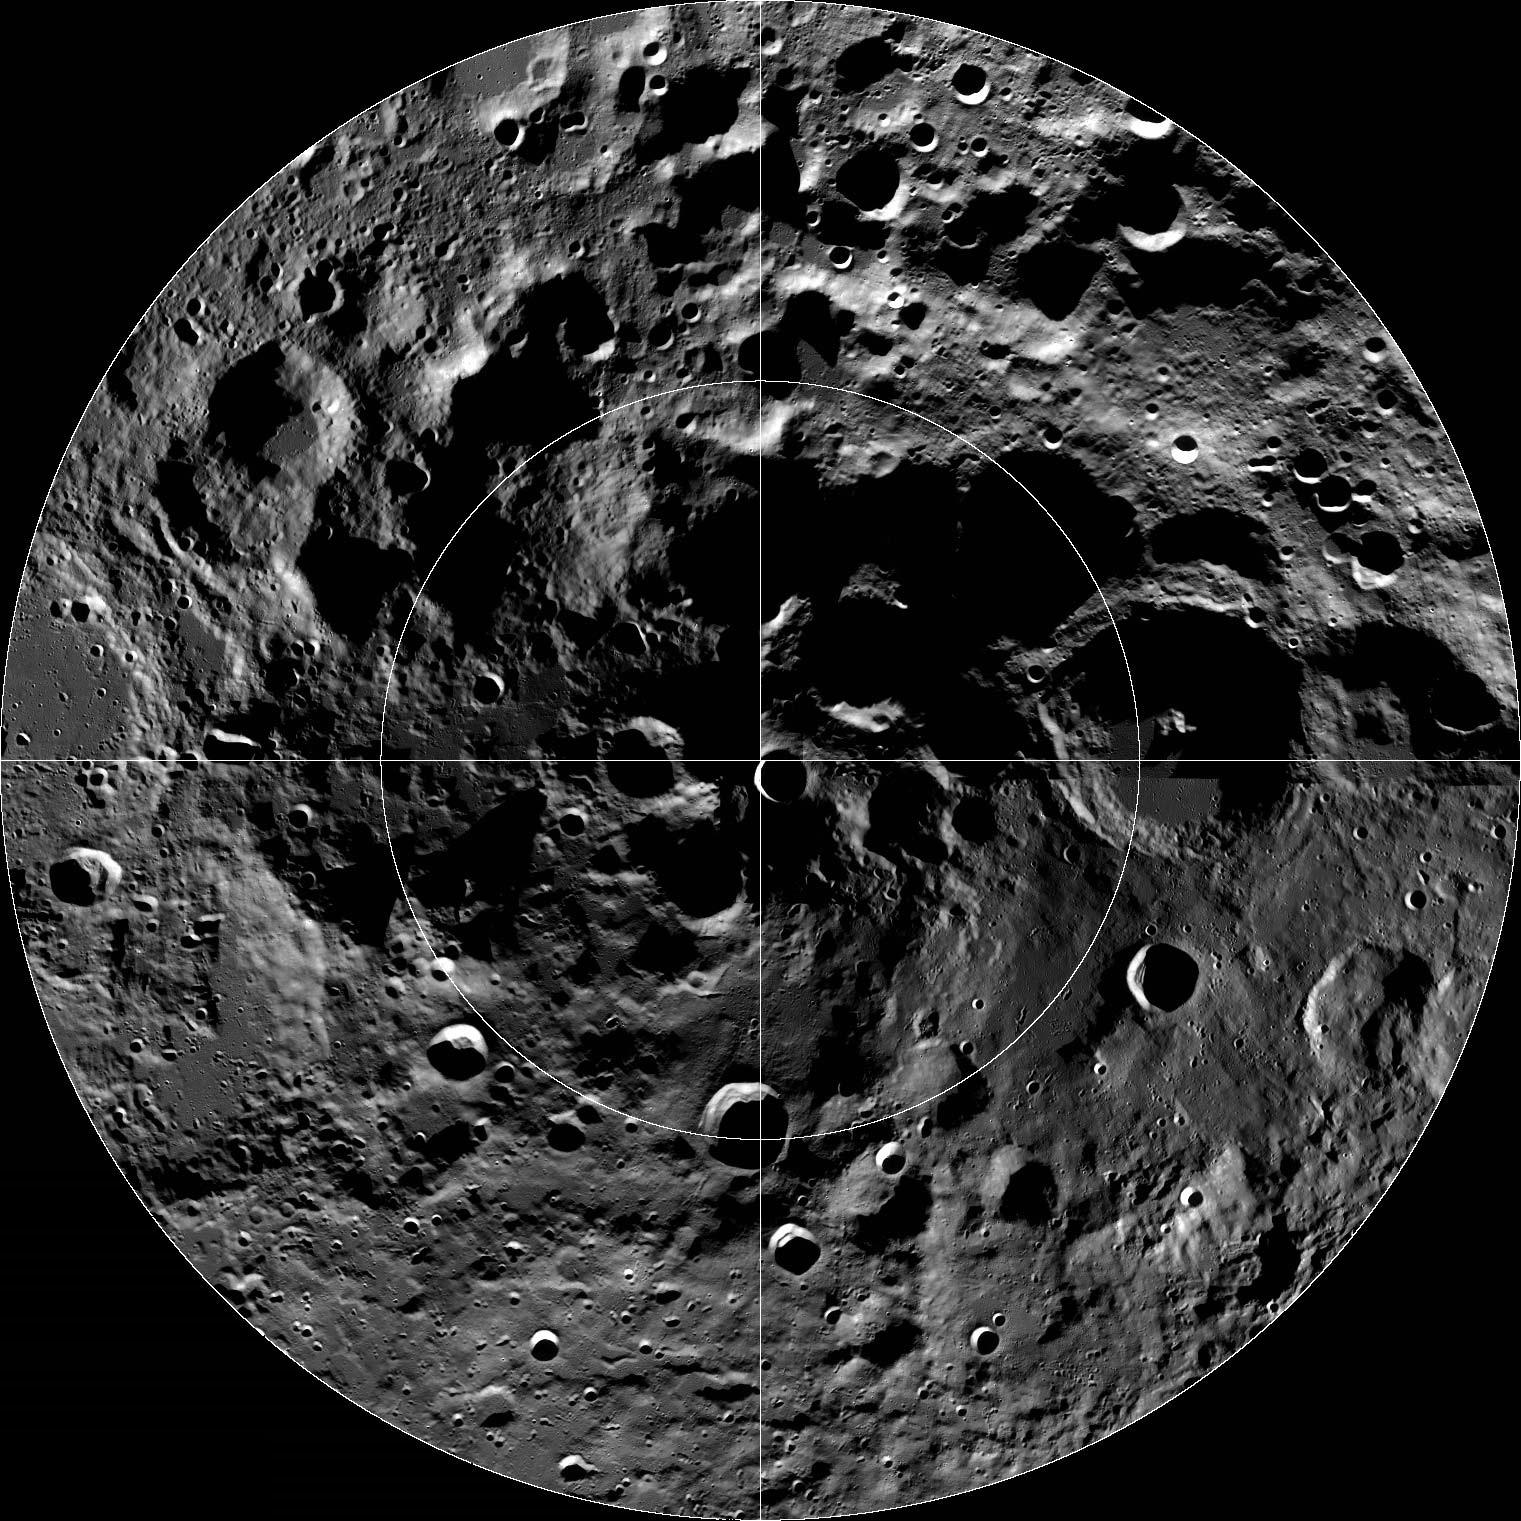 LROC Wide Angle Camera (WAC) mosaic of the lunar South Pole region; about 600 km width. Credit: NASA/GSFC/Arizona State University.